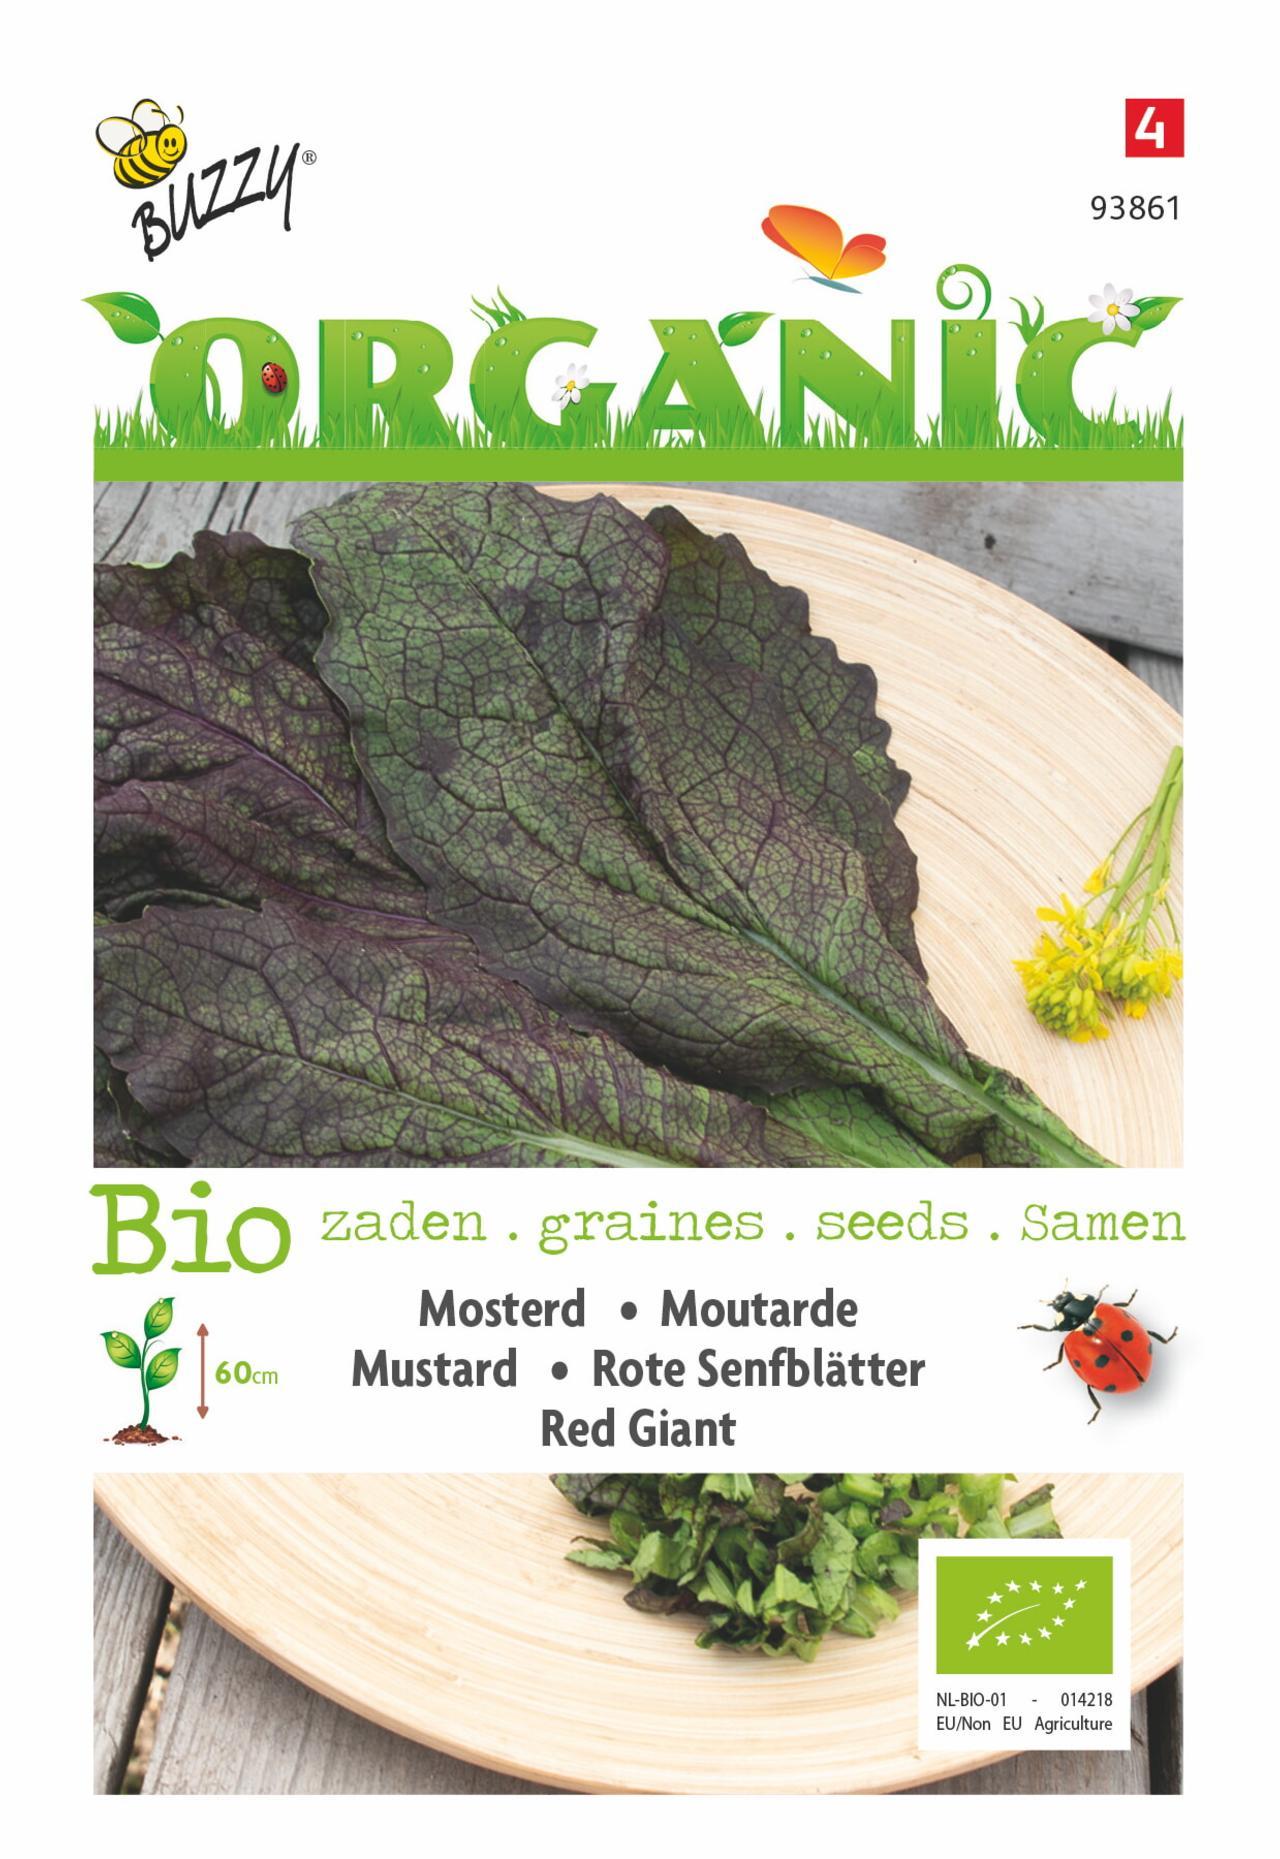 Brassica juncea 'Red Giant' (BIO) plant